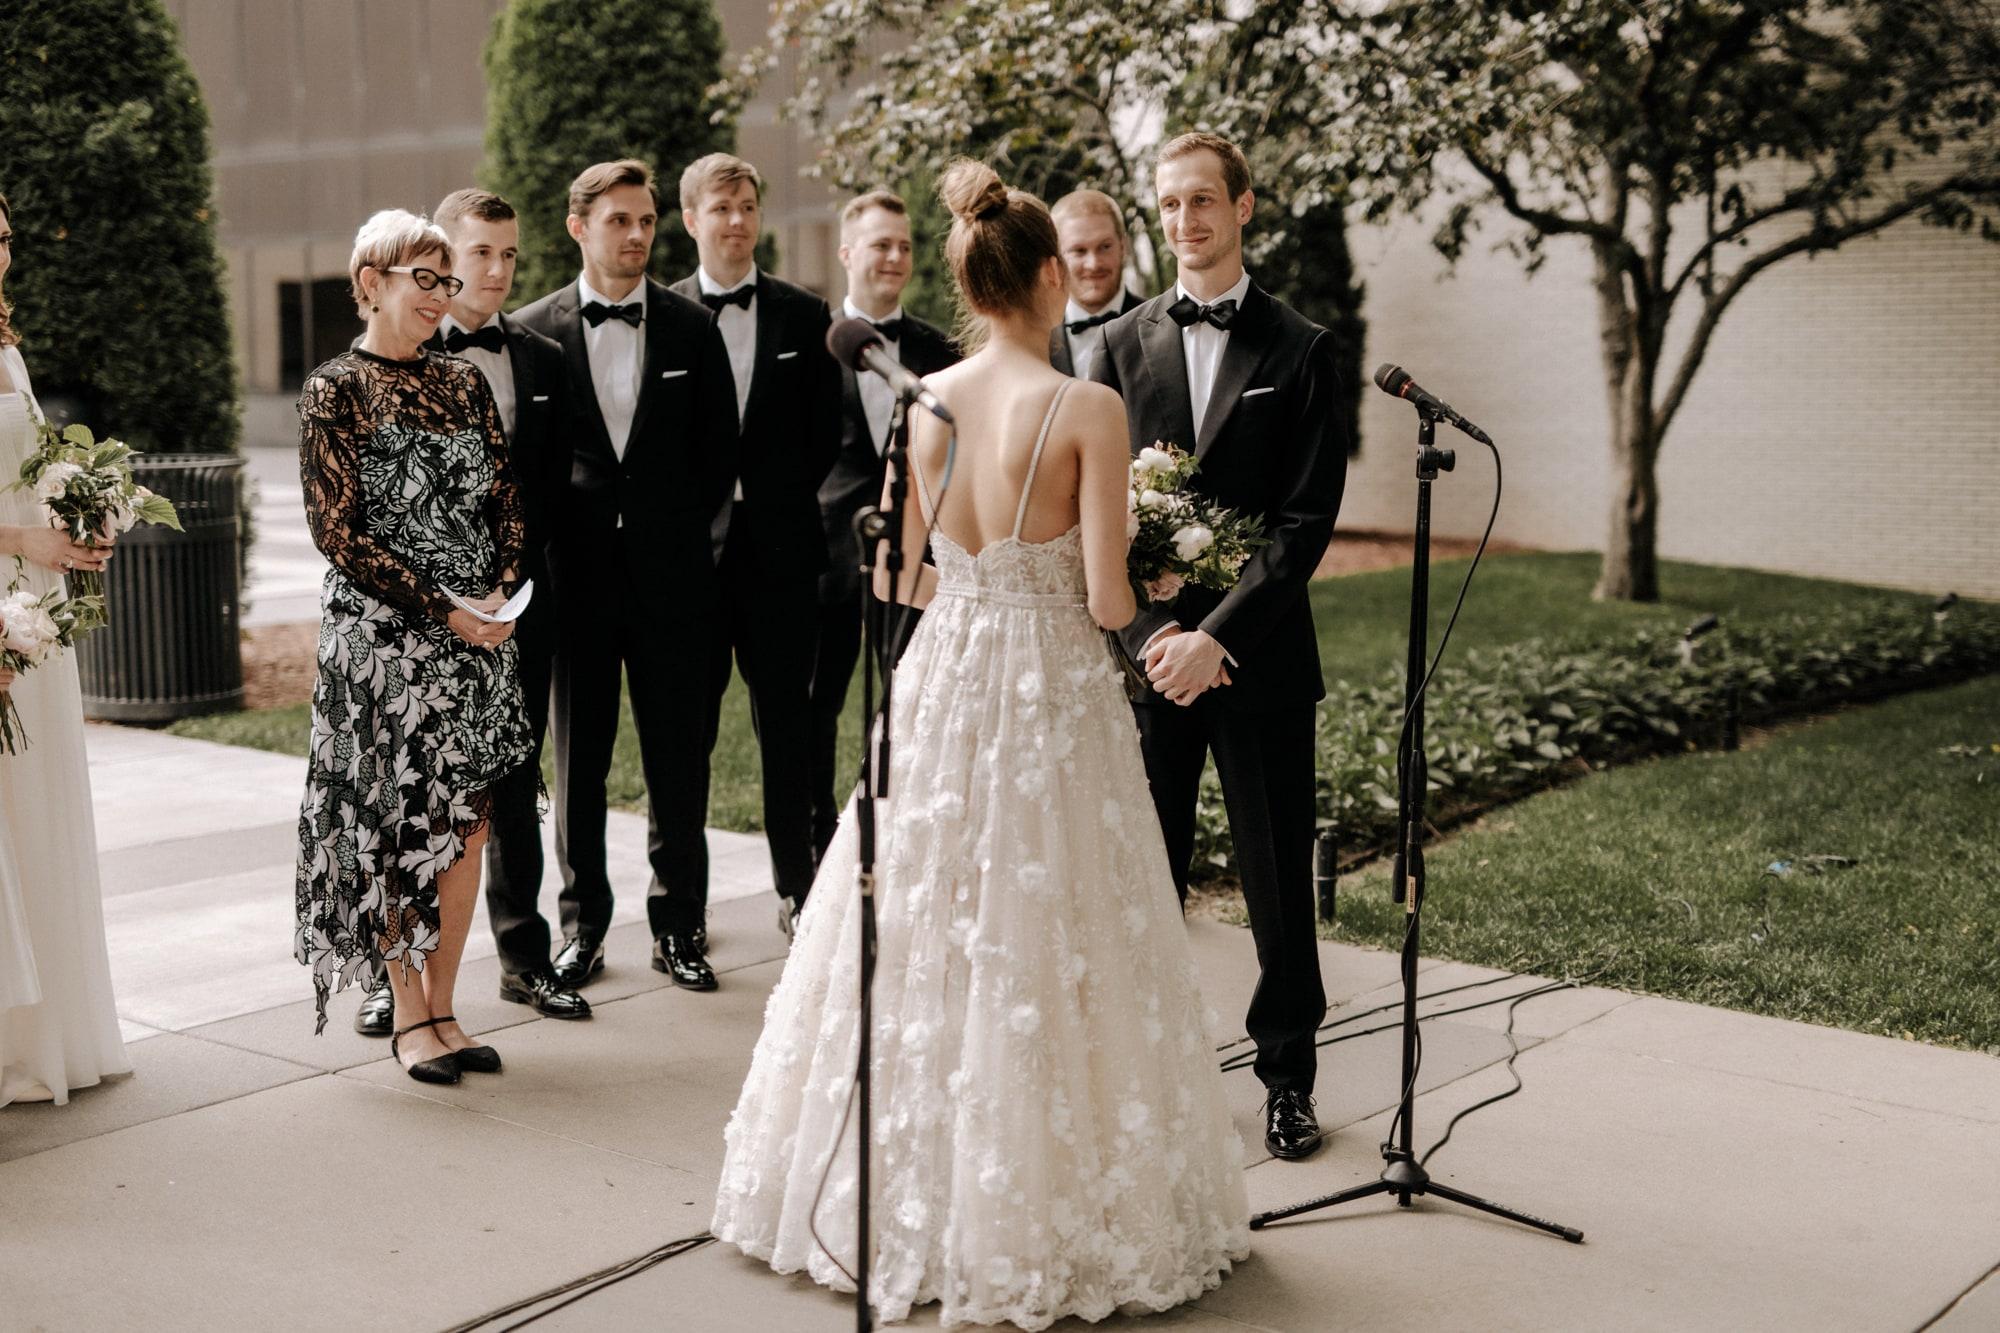 MIA-Minneapolis-Institute-Art-Summer-Wedding-_30.jpg